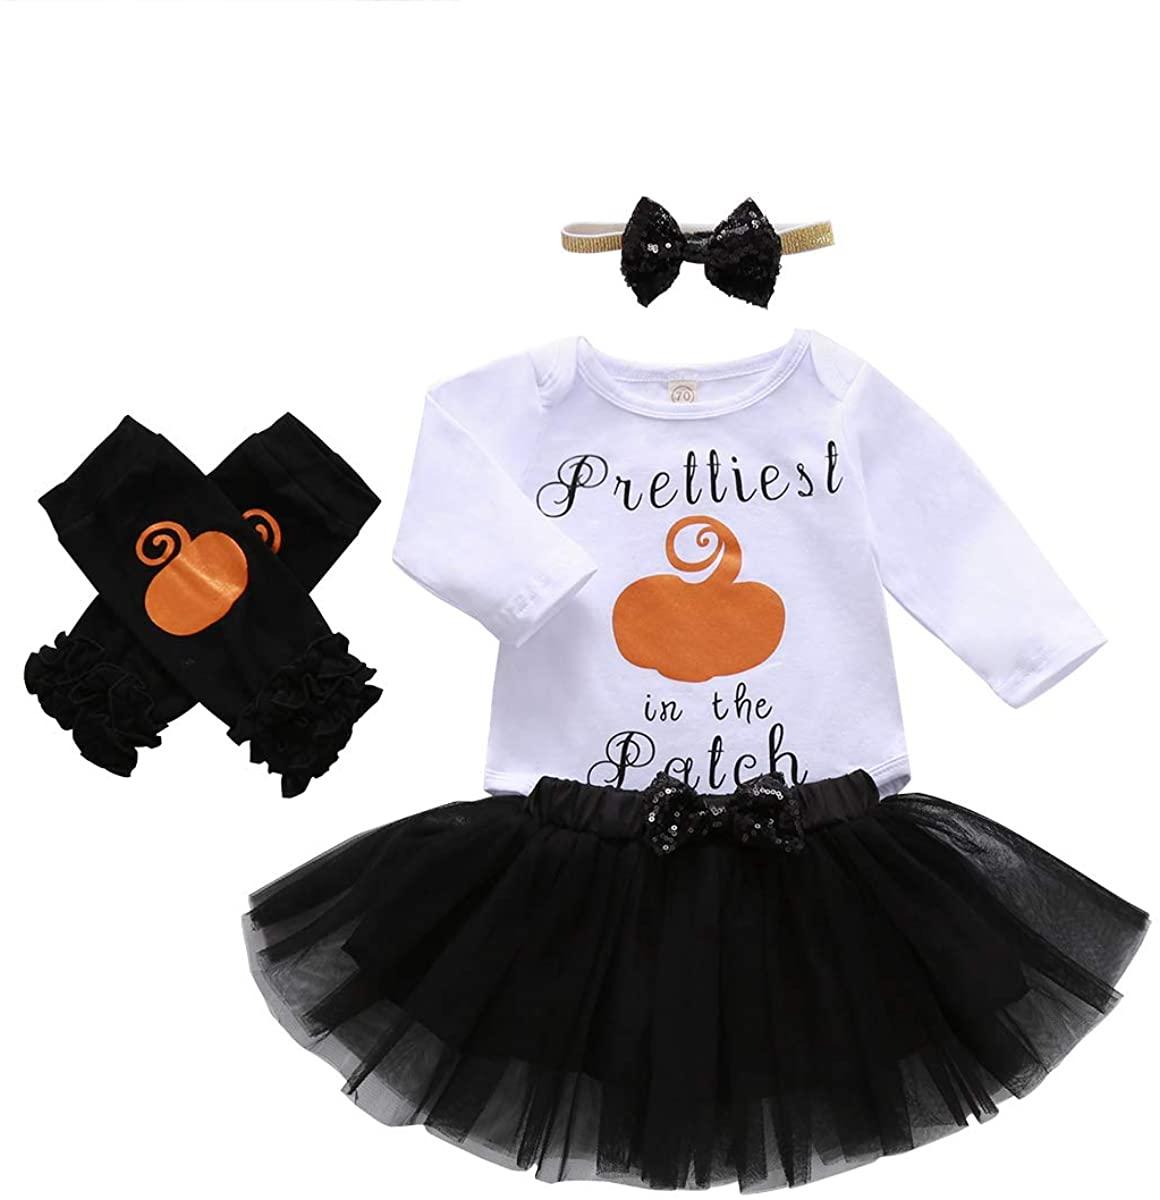 4PCS Infant Baby Girl My 1st Halloween Outfits Long Sleeve Pumpkin Romper+Tutu Skirt+Headbands